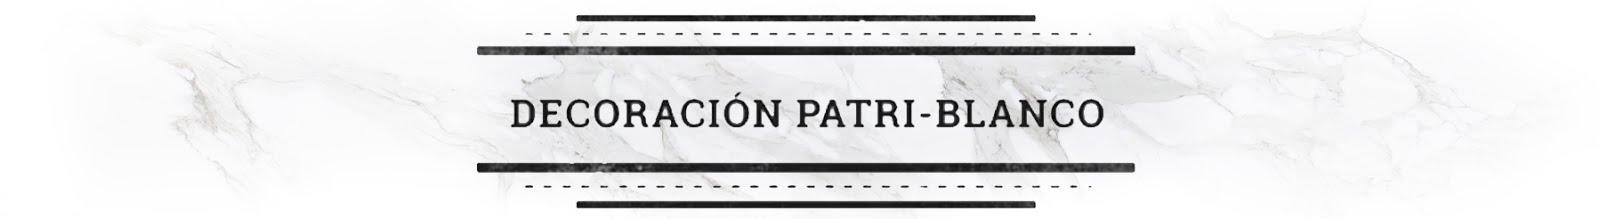 Deco Patri-Blanco